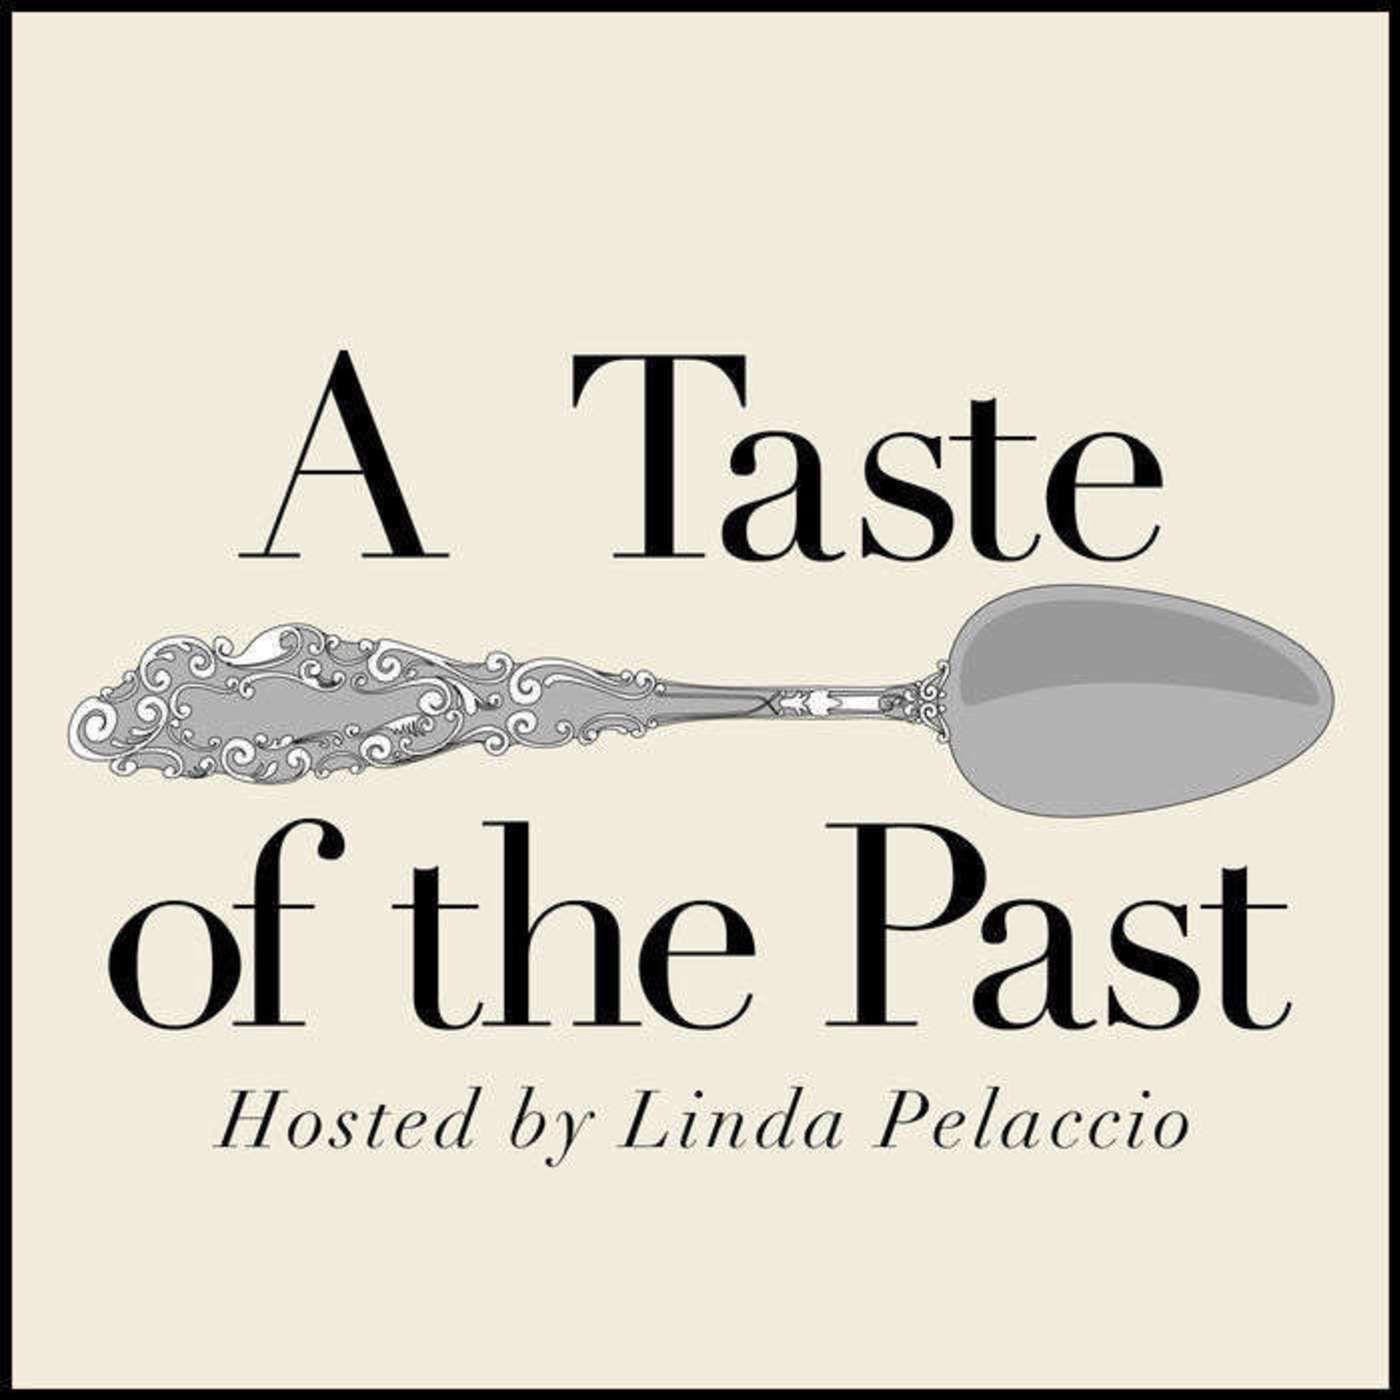 Episode 4: Mesopotamian Cuisine with Cathy Kaufman